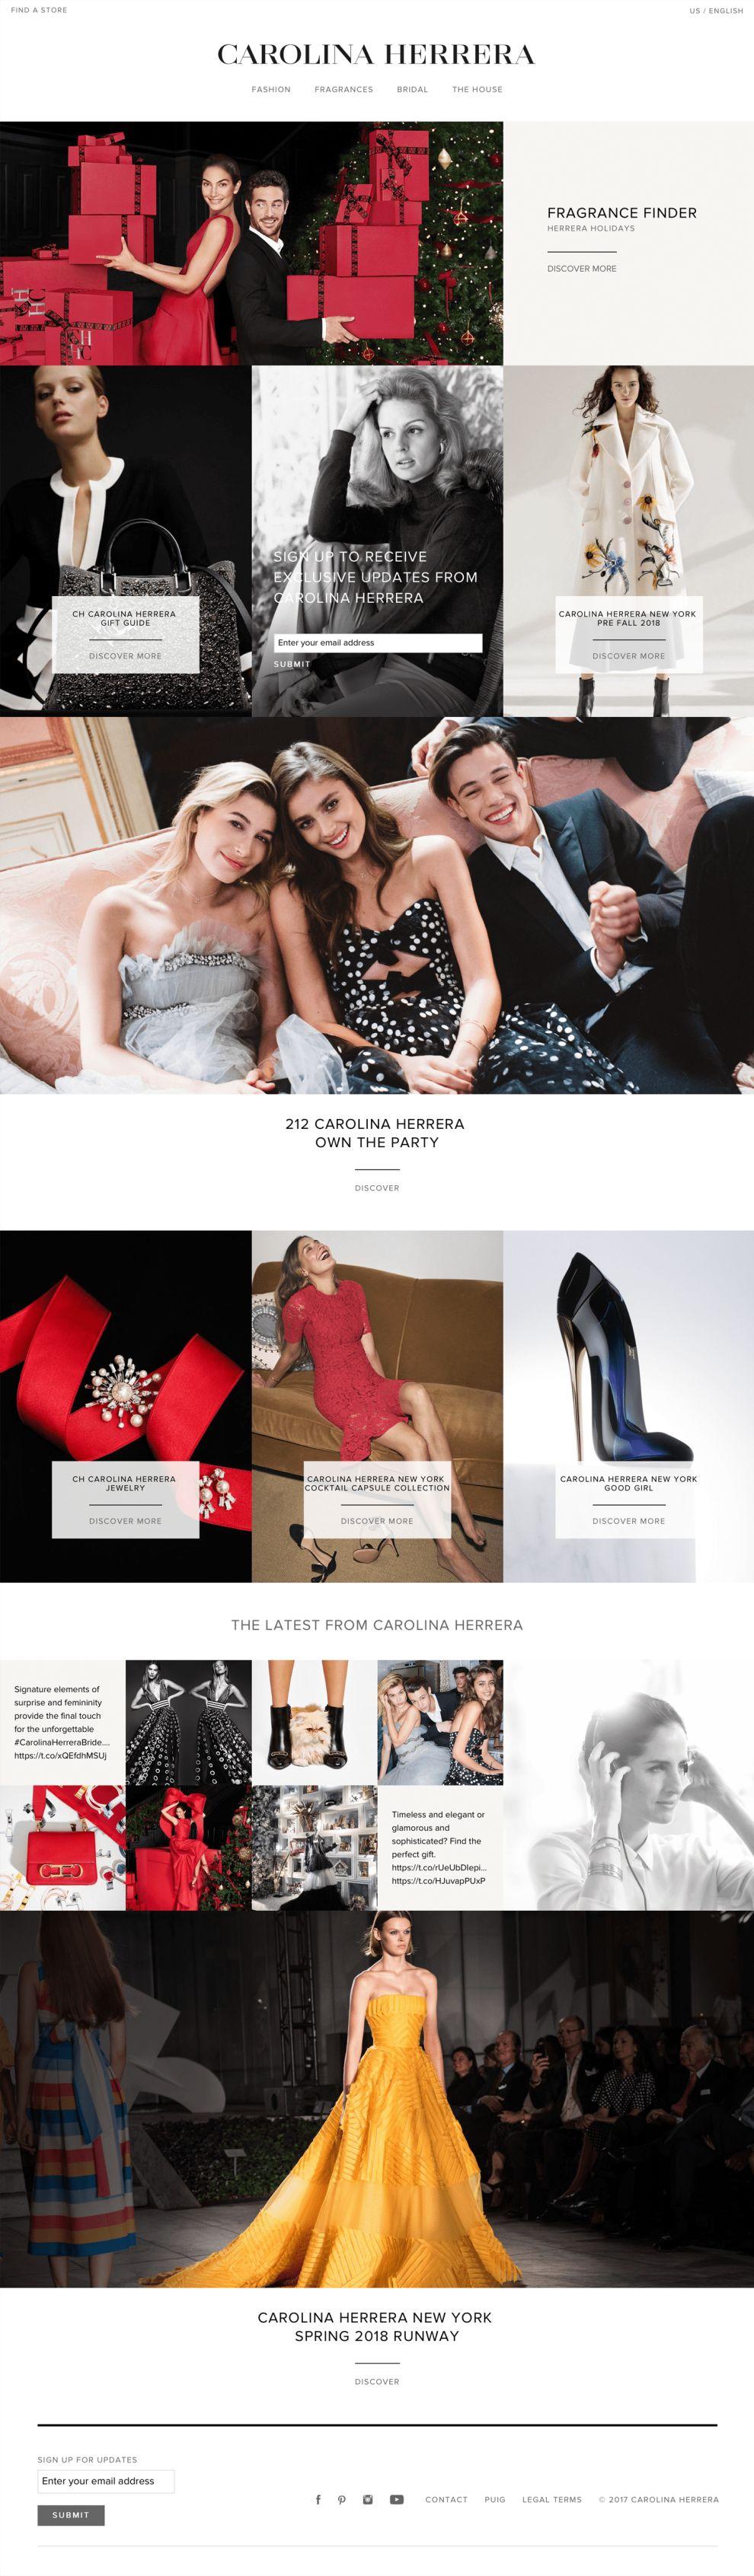 Carolina Herrera Elegant Homepage